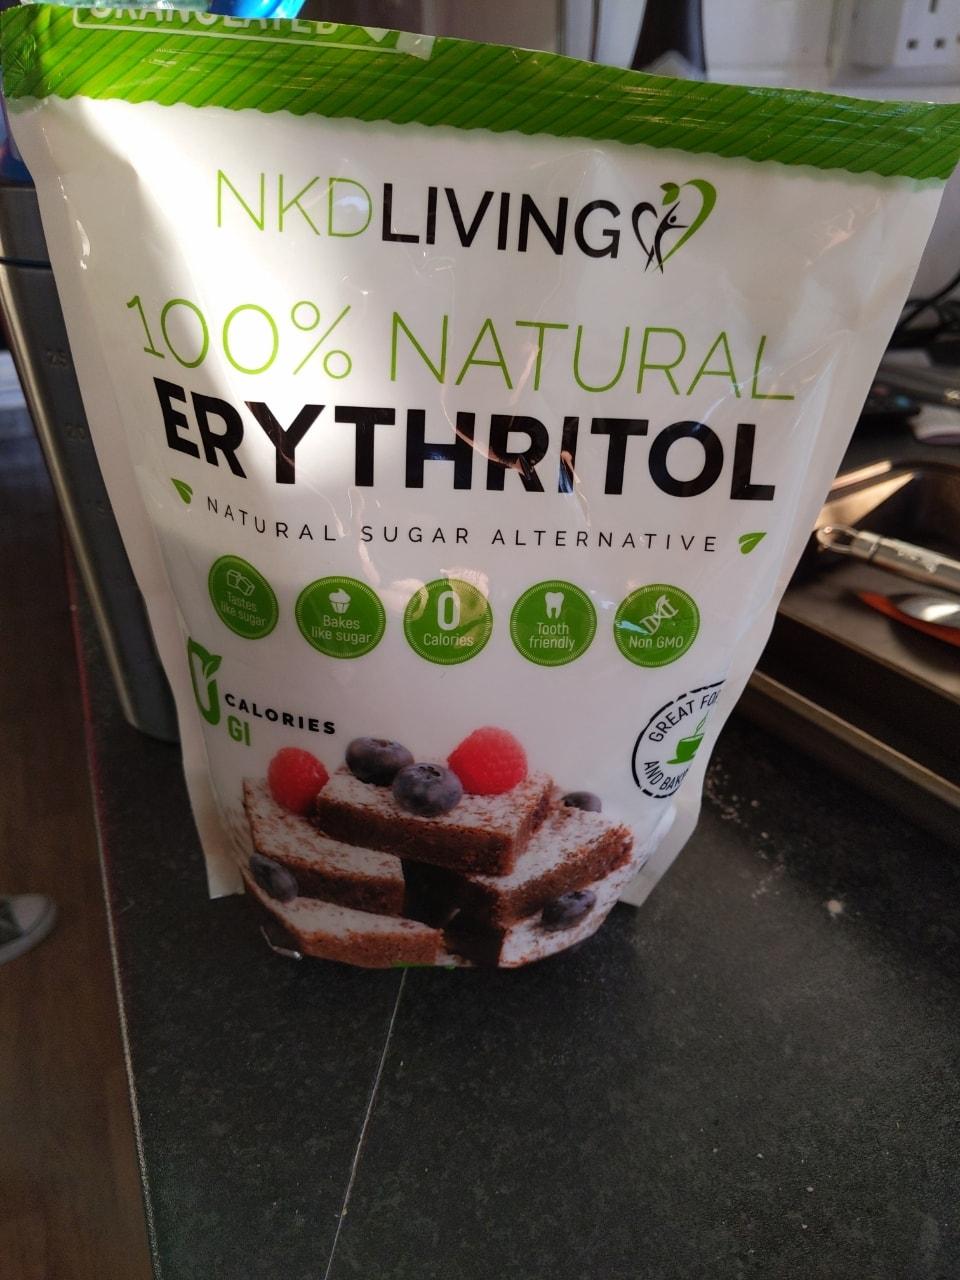 Natural sugar alternative